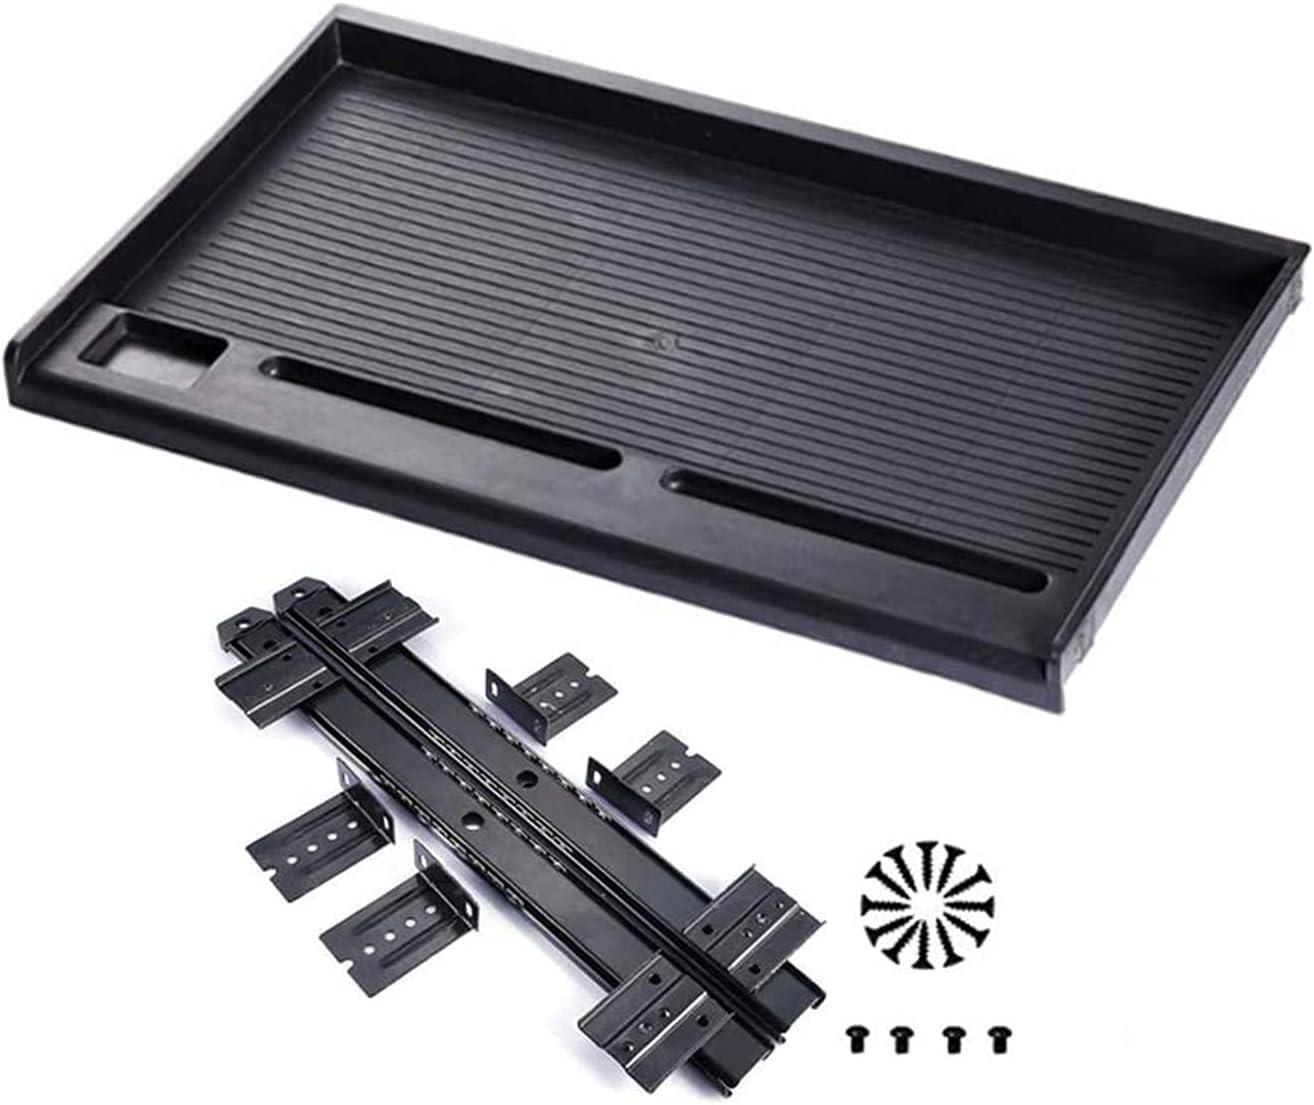 Keyboard Tray Under Desk Adjustable Brand Cheap Sale Venue Mail order - Black Height White Sliding